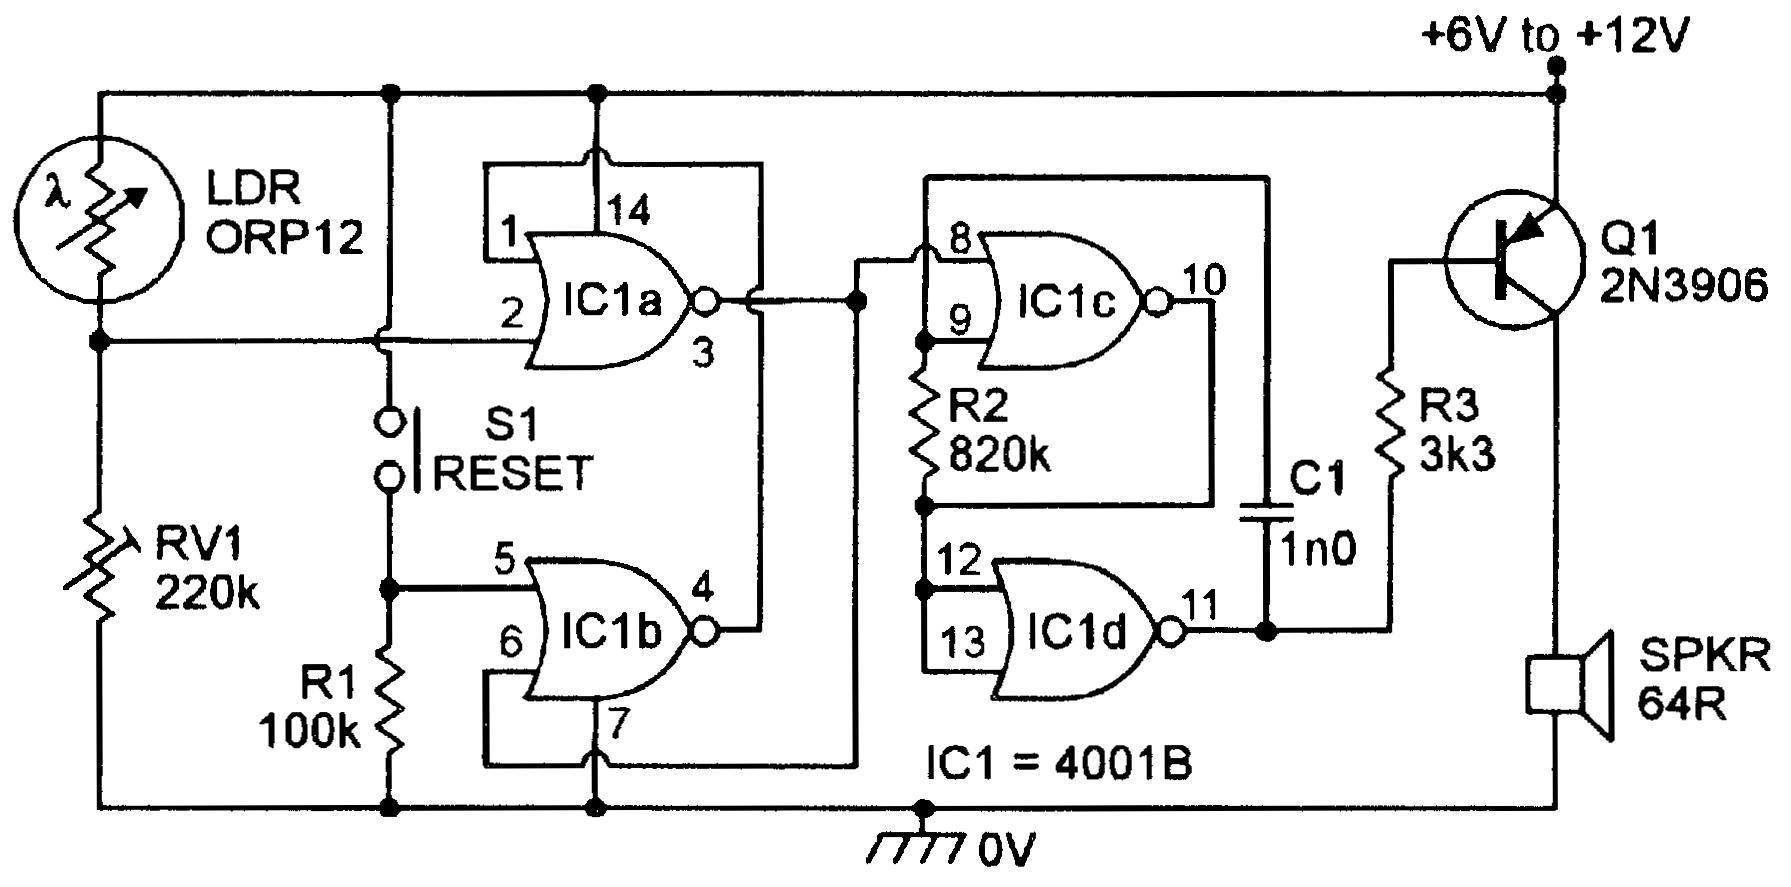 Light Sensitive Circuits